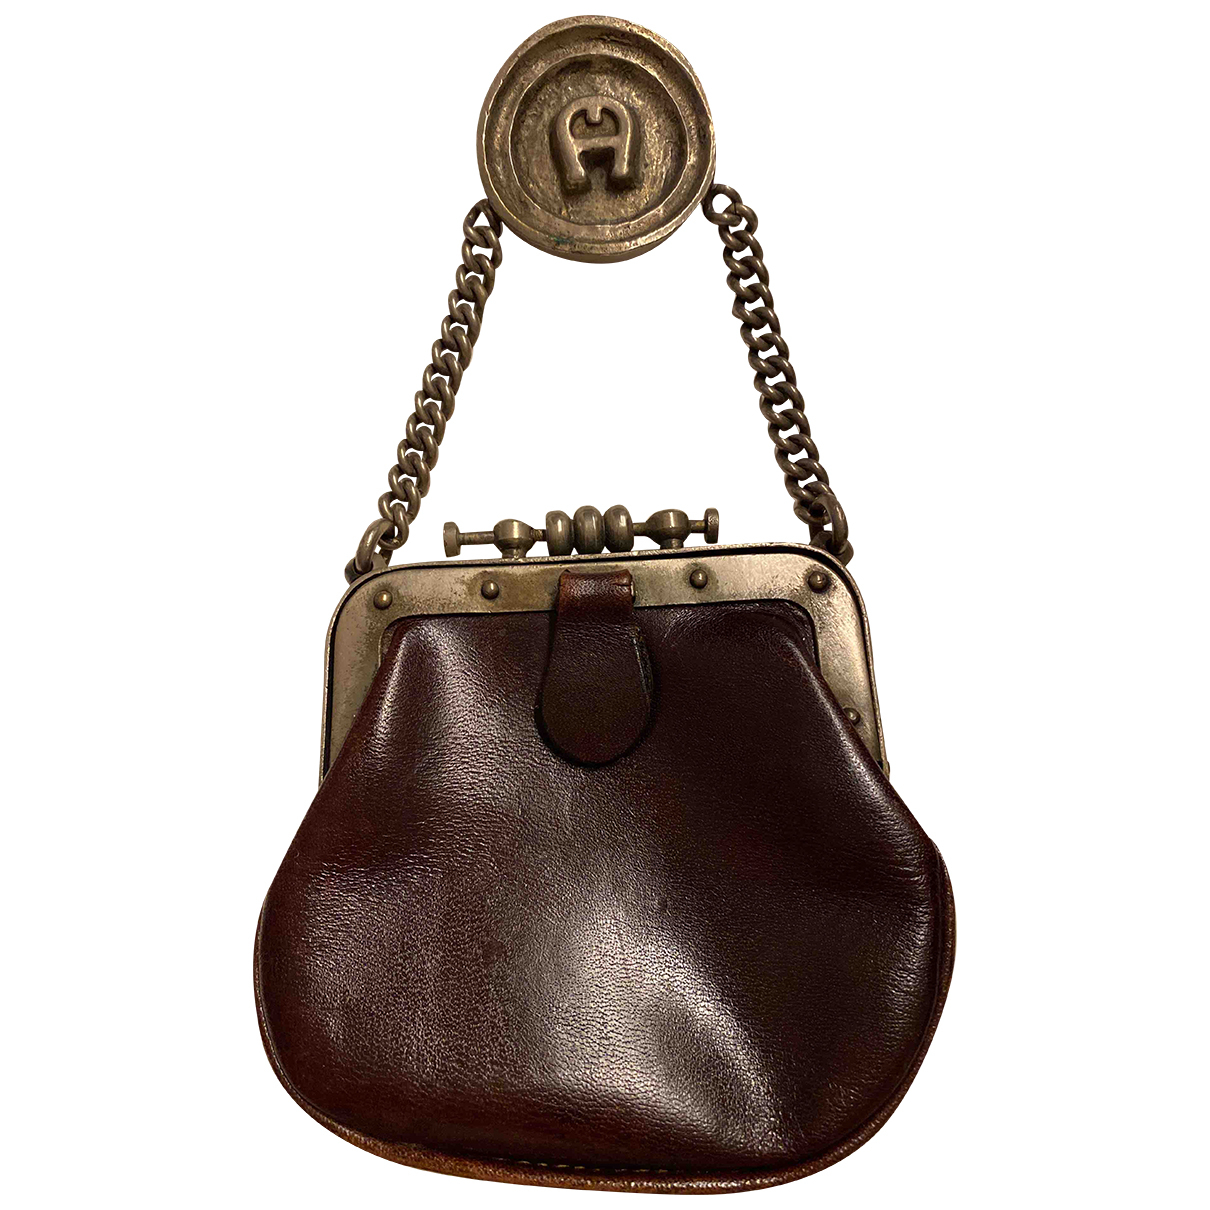 Etienne Aigner N Burgundy Leather Purses, wallet & cases for Women N